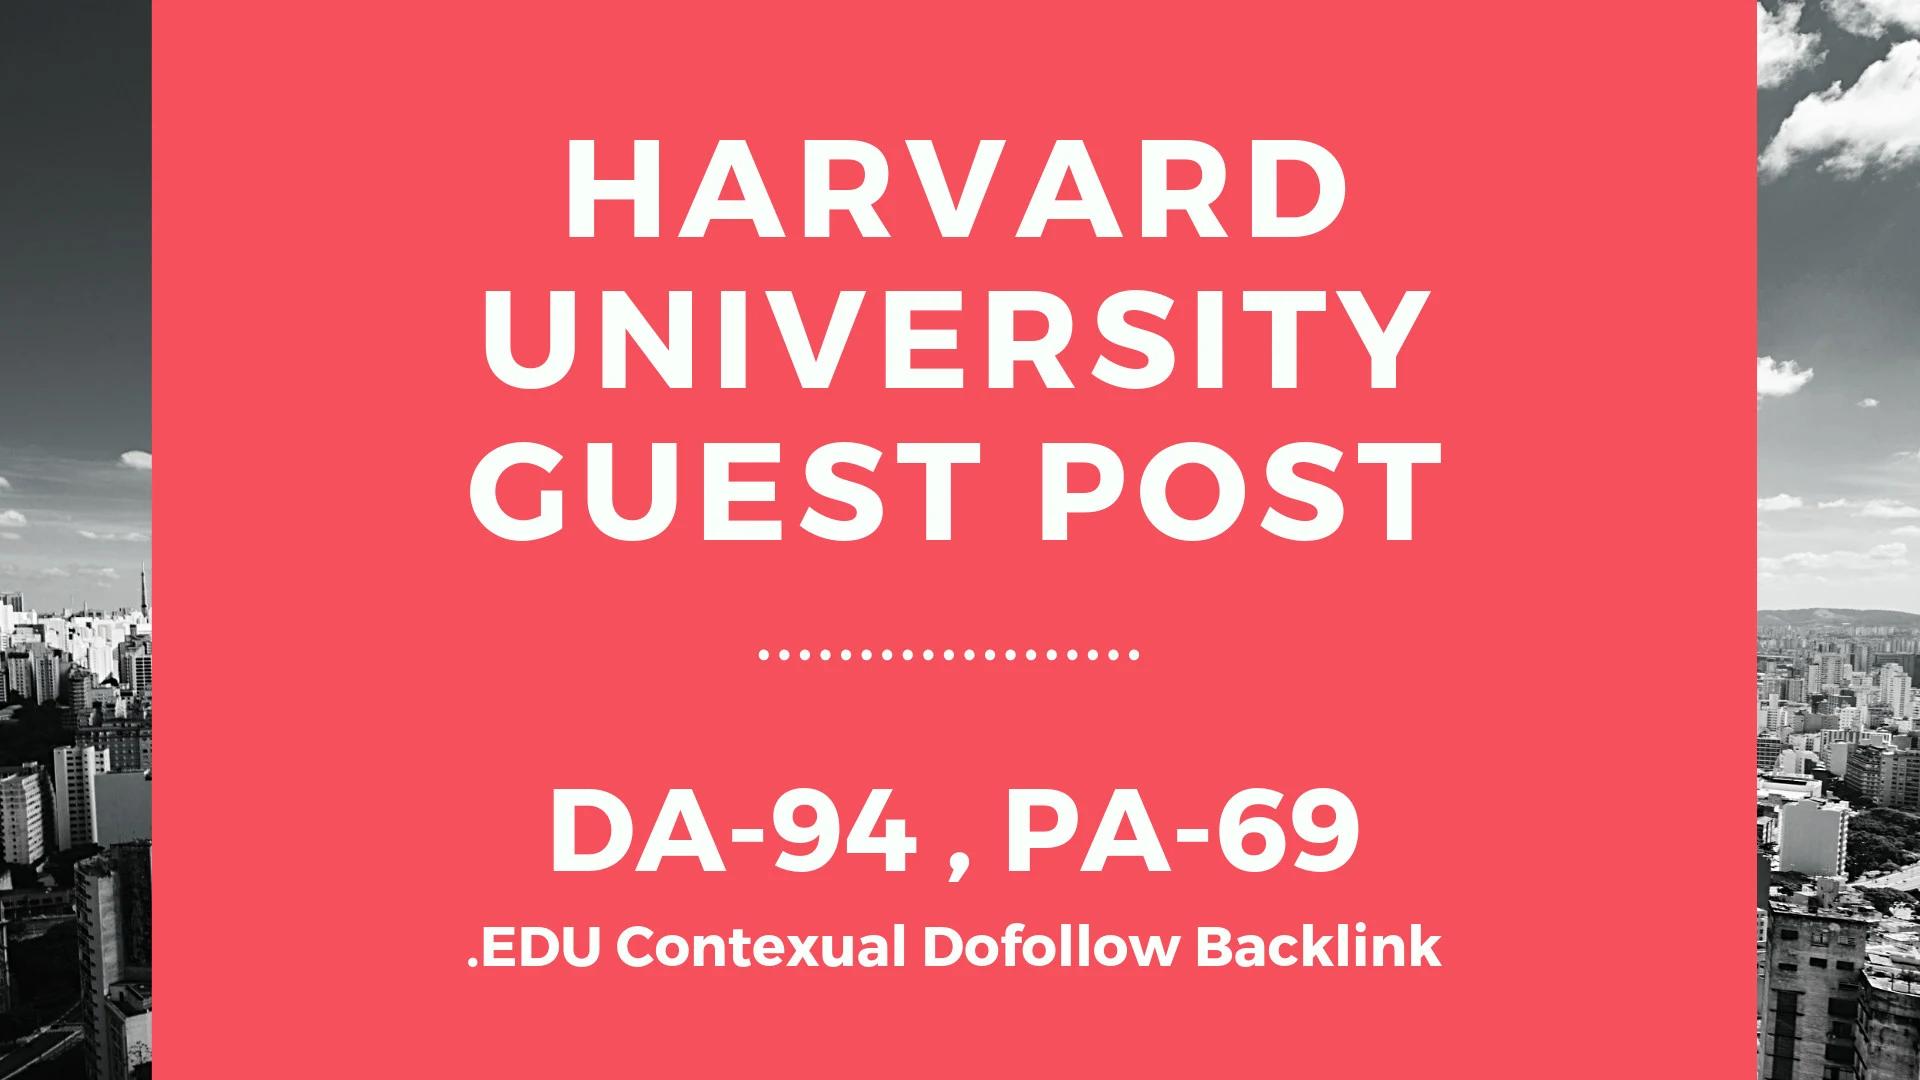 Publish a Guest Post on Harvard University harvard. edu - DA94